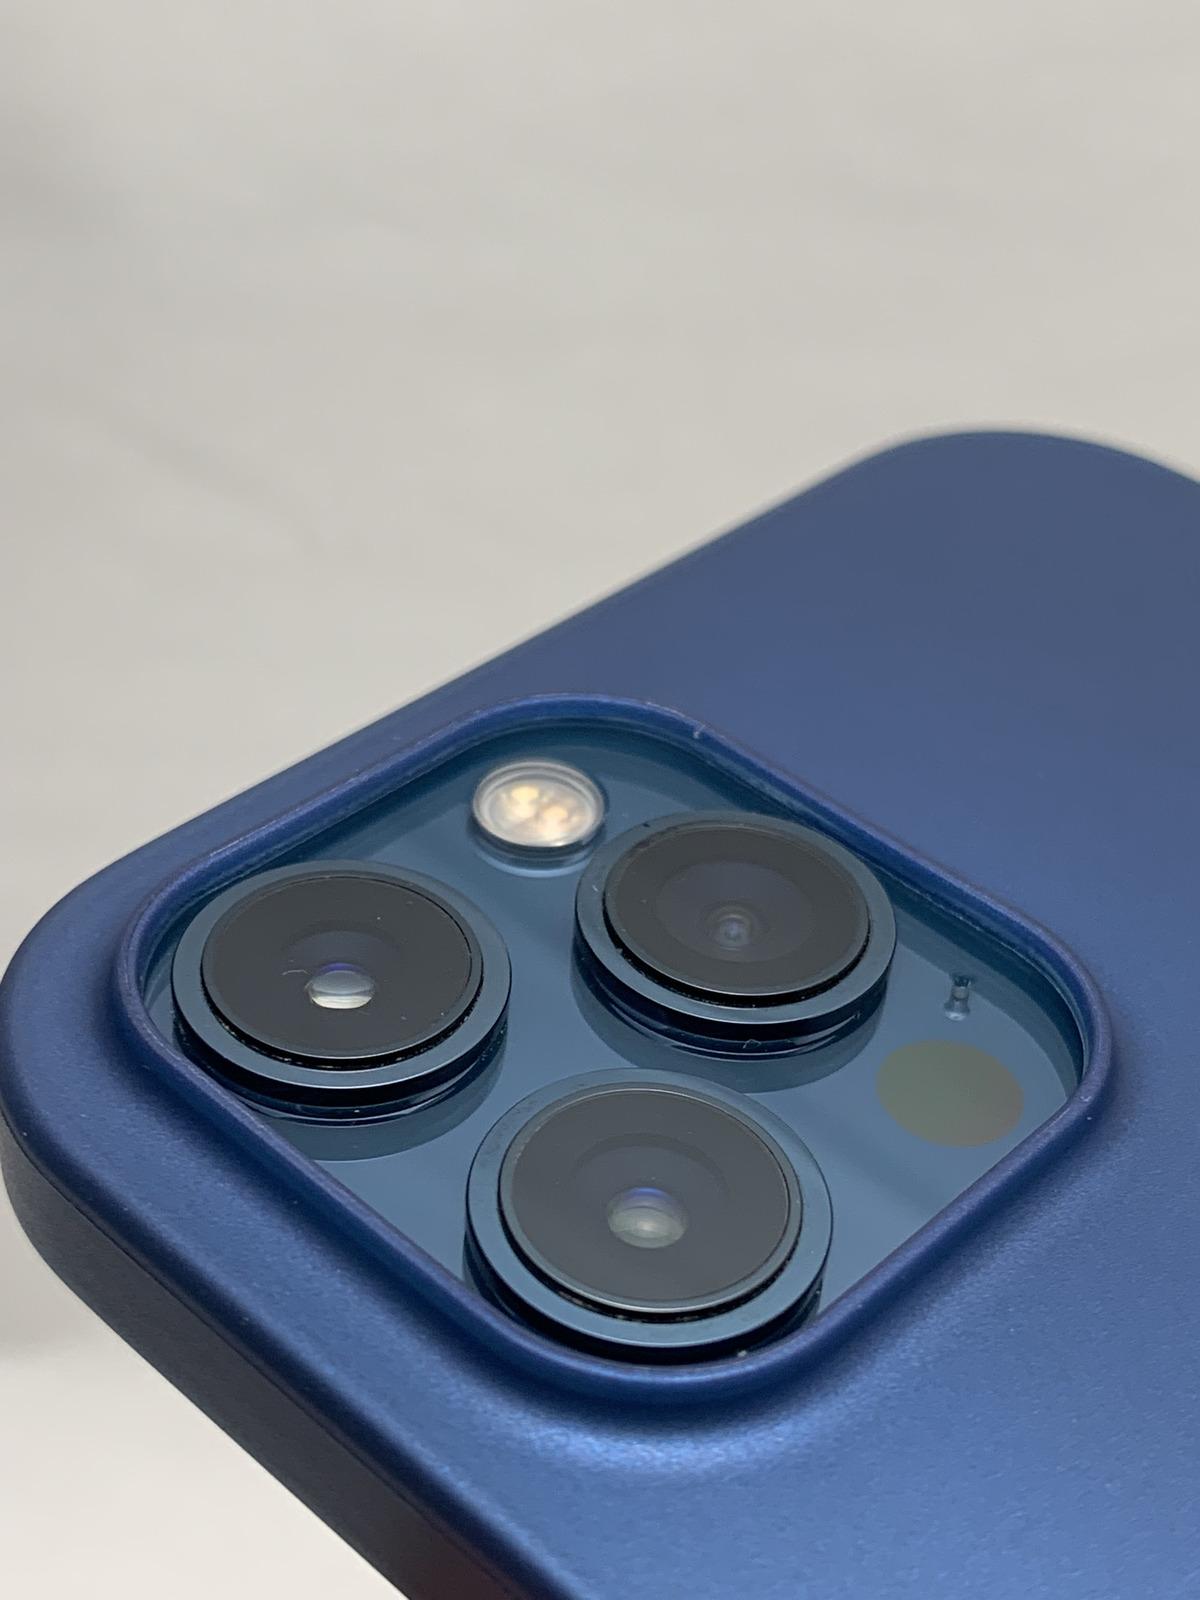 iphone12-case-10-photo-031